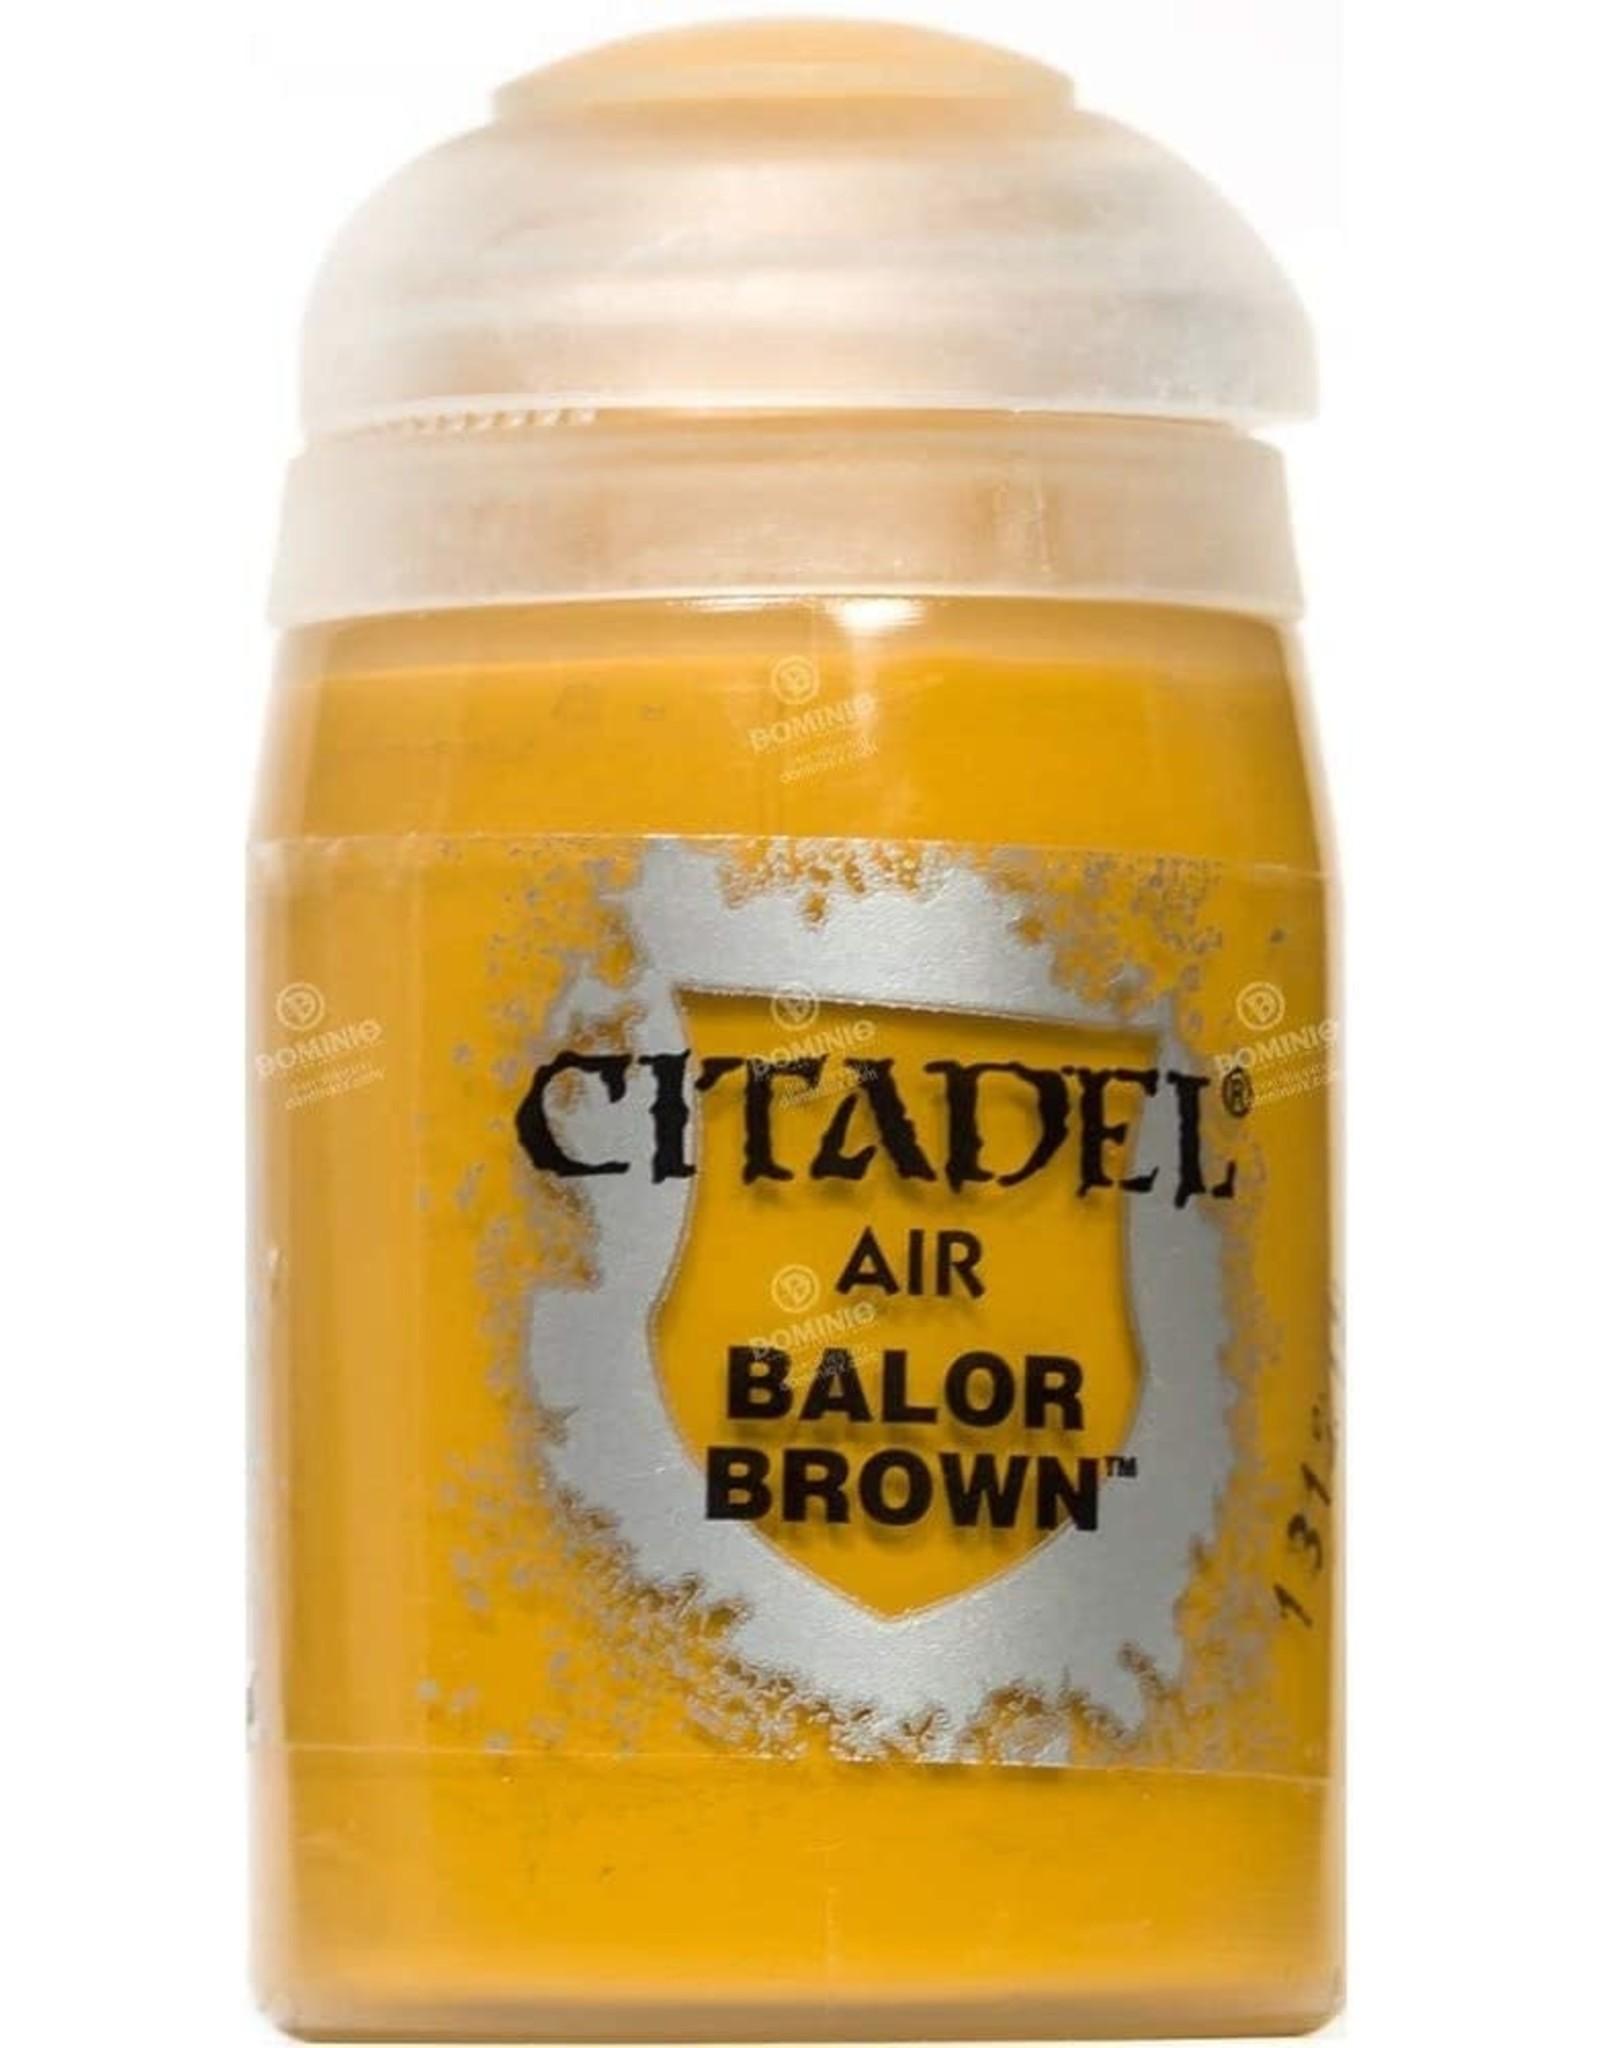 Games Workshop Citadel Paint: Balor Brown Air (24 ml)